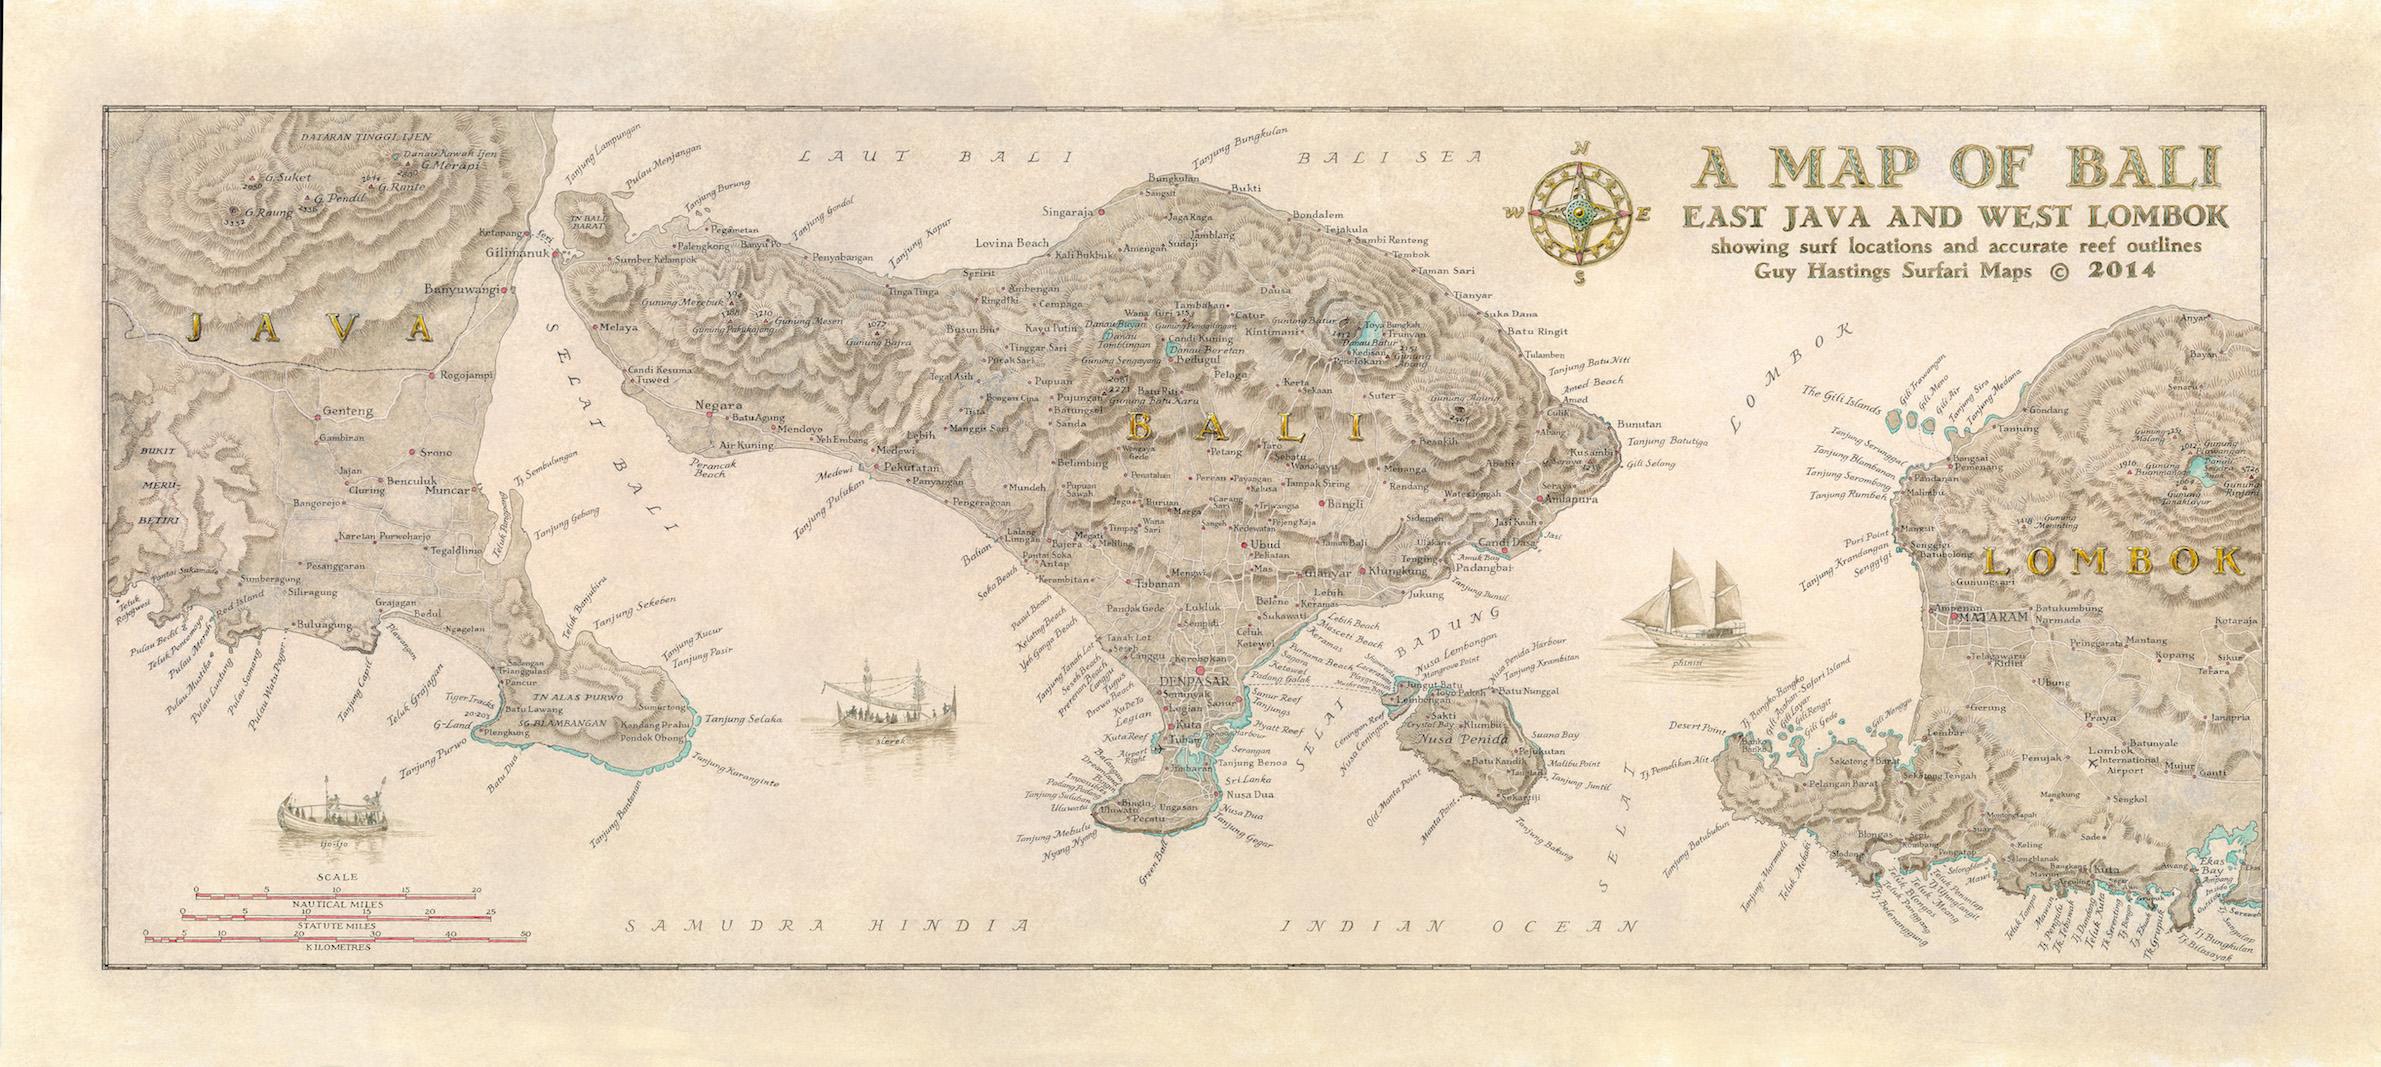 Guy S Surfari Maps